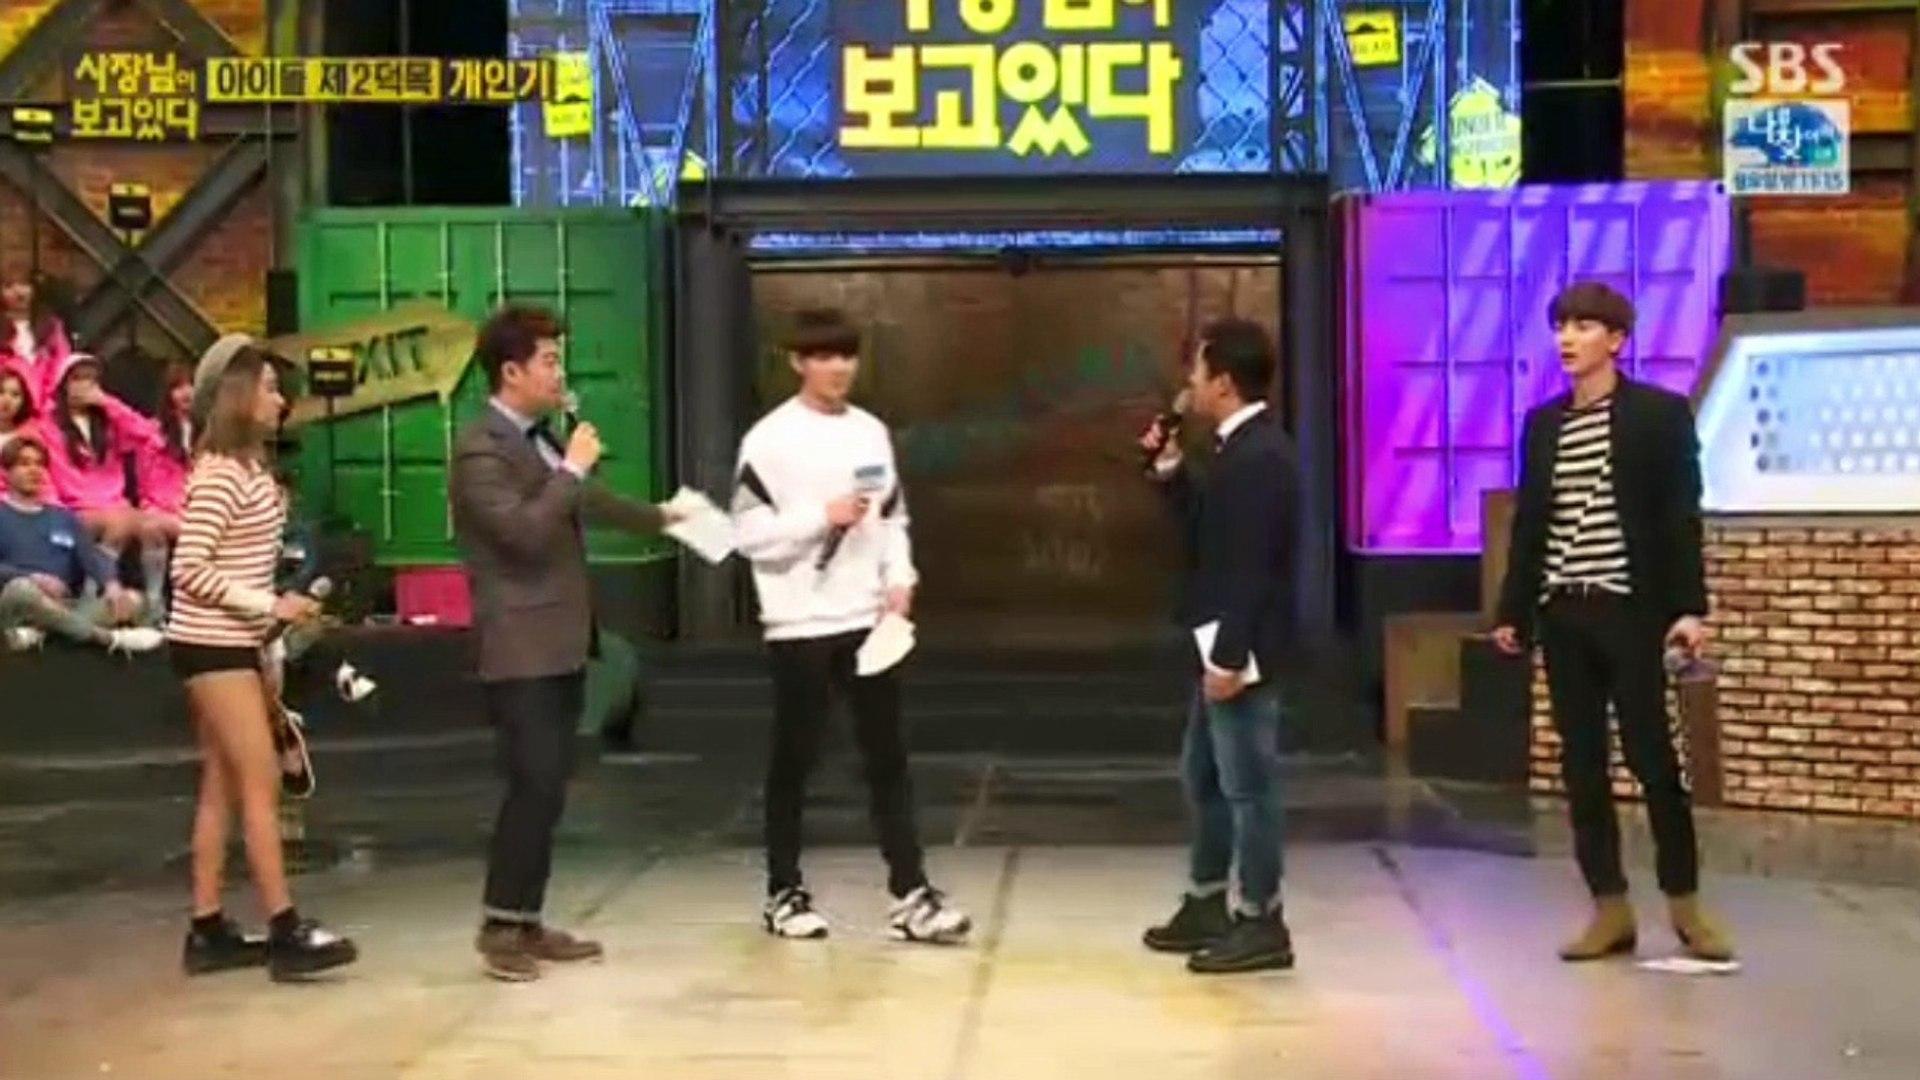 BTS Jungkook Zion T Impression